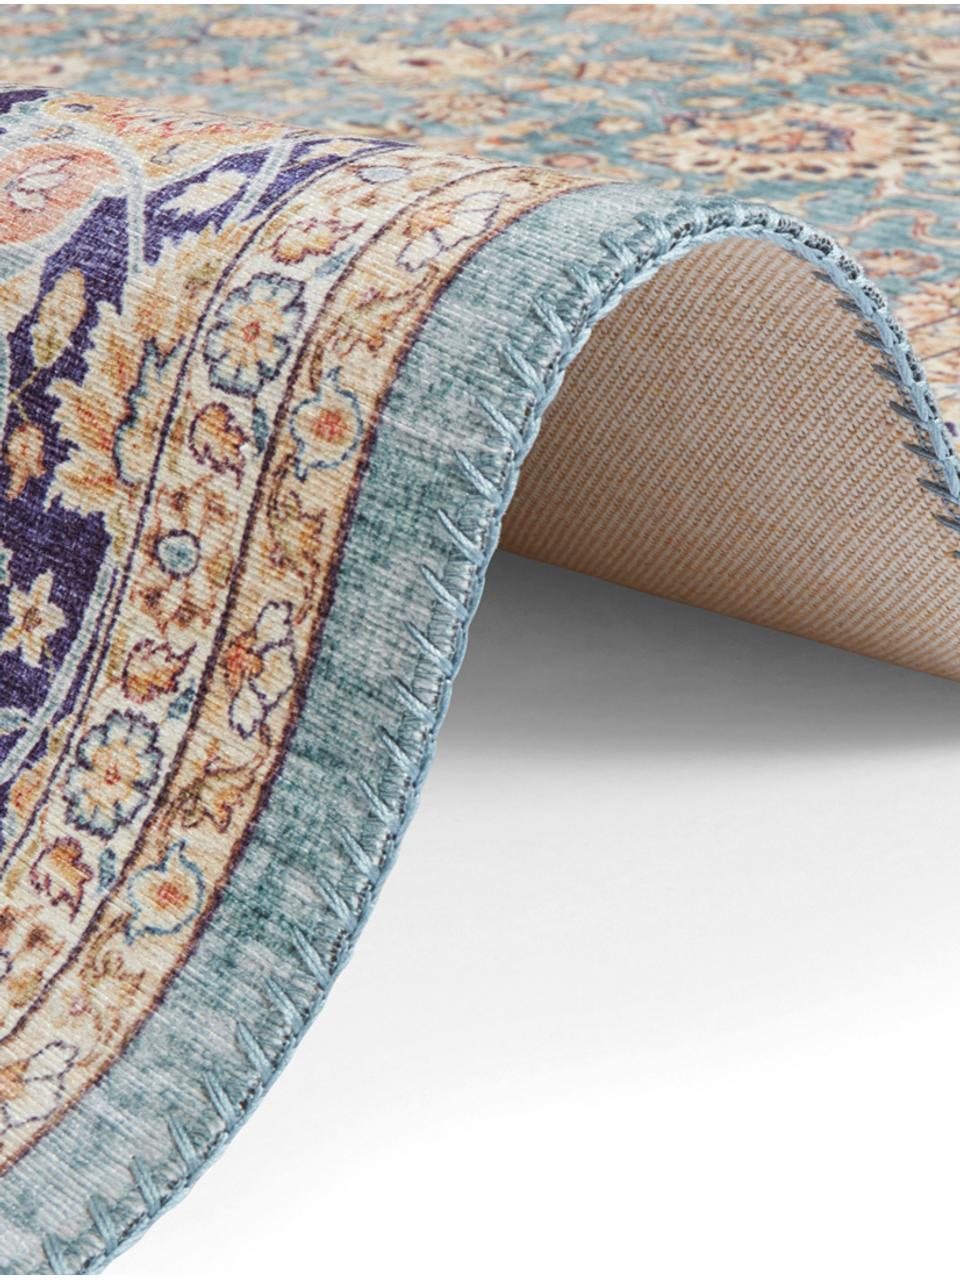 Teppich Keshan Maschad im Orient Style, Jadegrün, Mehrfarbig, B 200 x L 290 cm (Größe L)